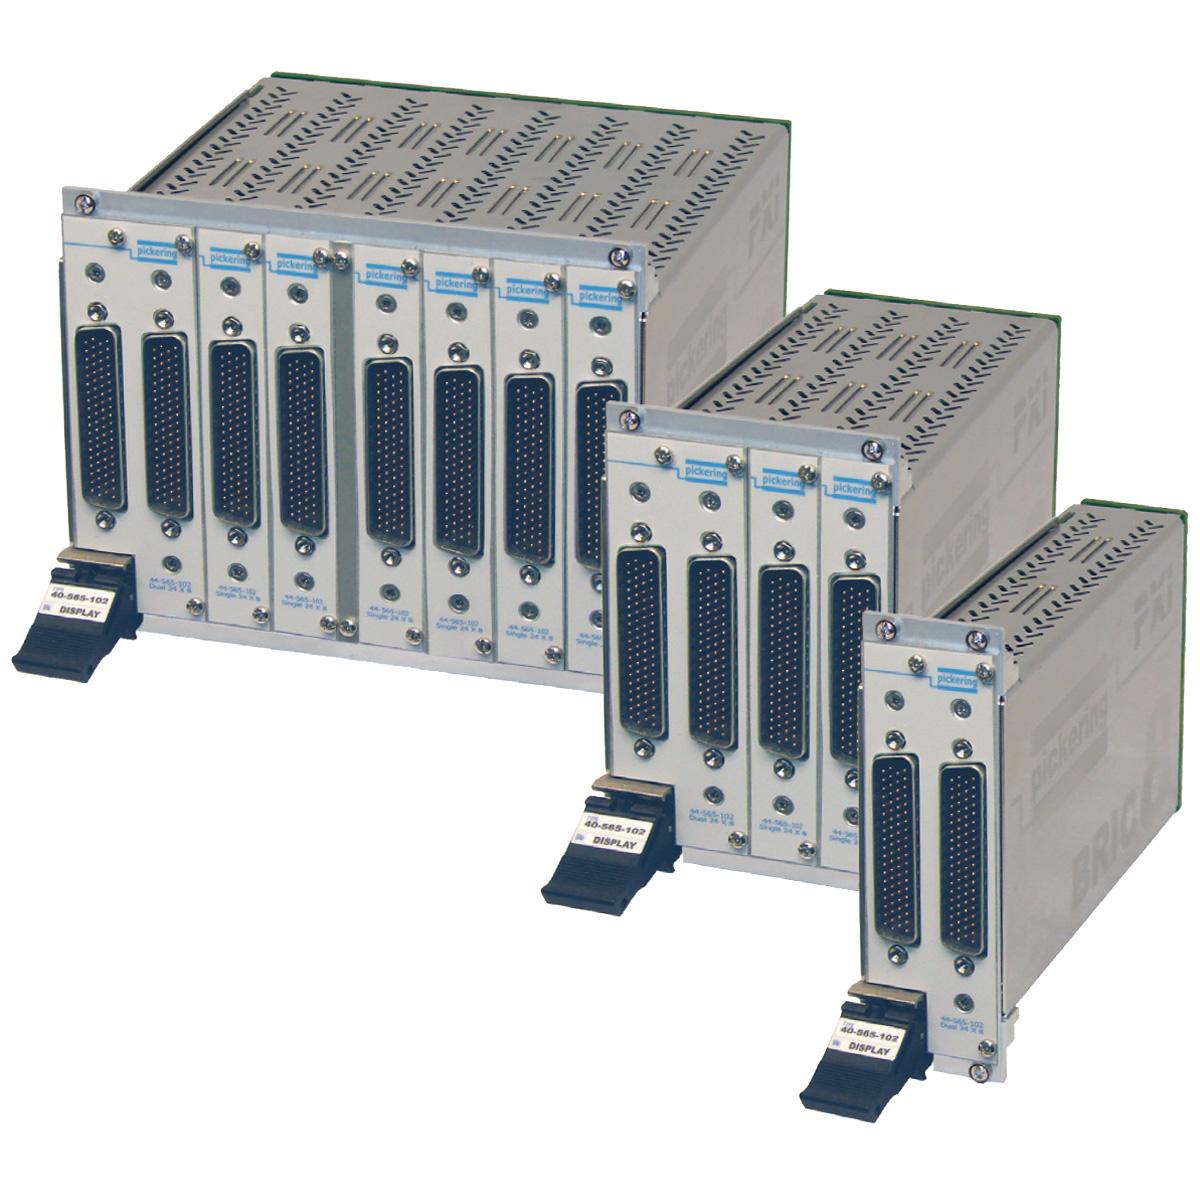 2 Amp PXI Large Matrix Modules - 40-566